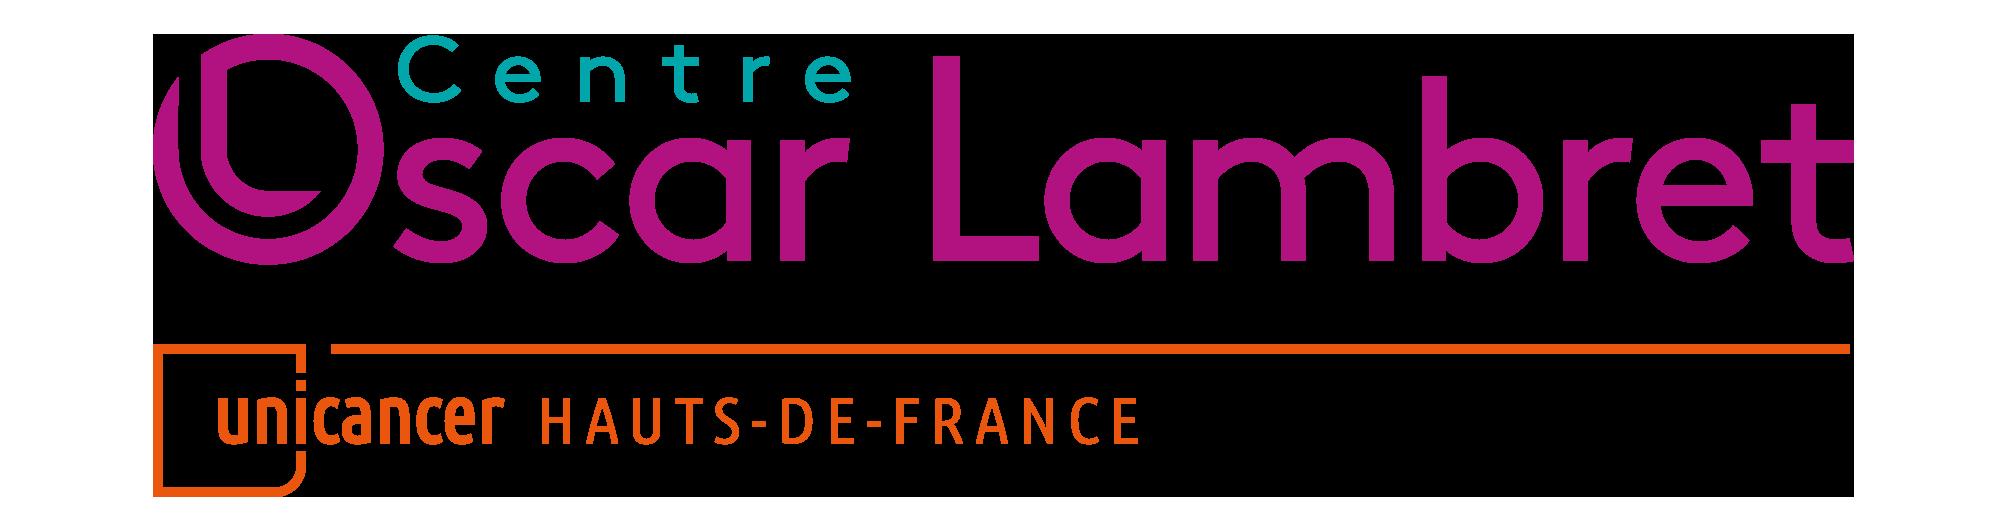 Centre Oscar Lambret website